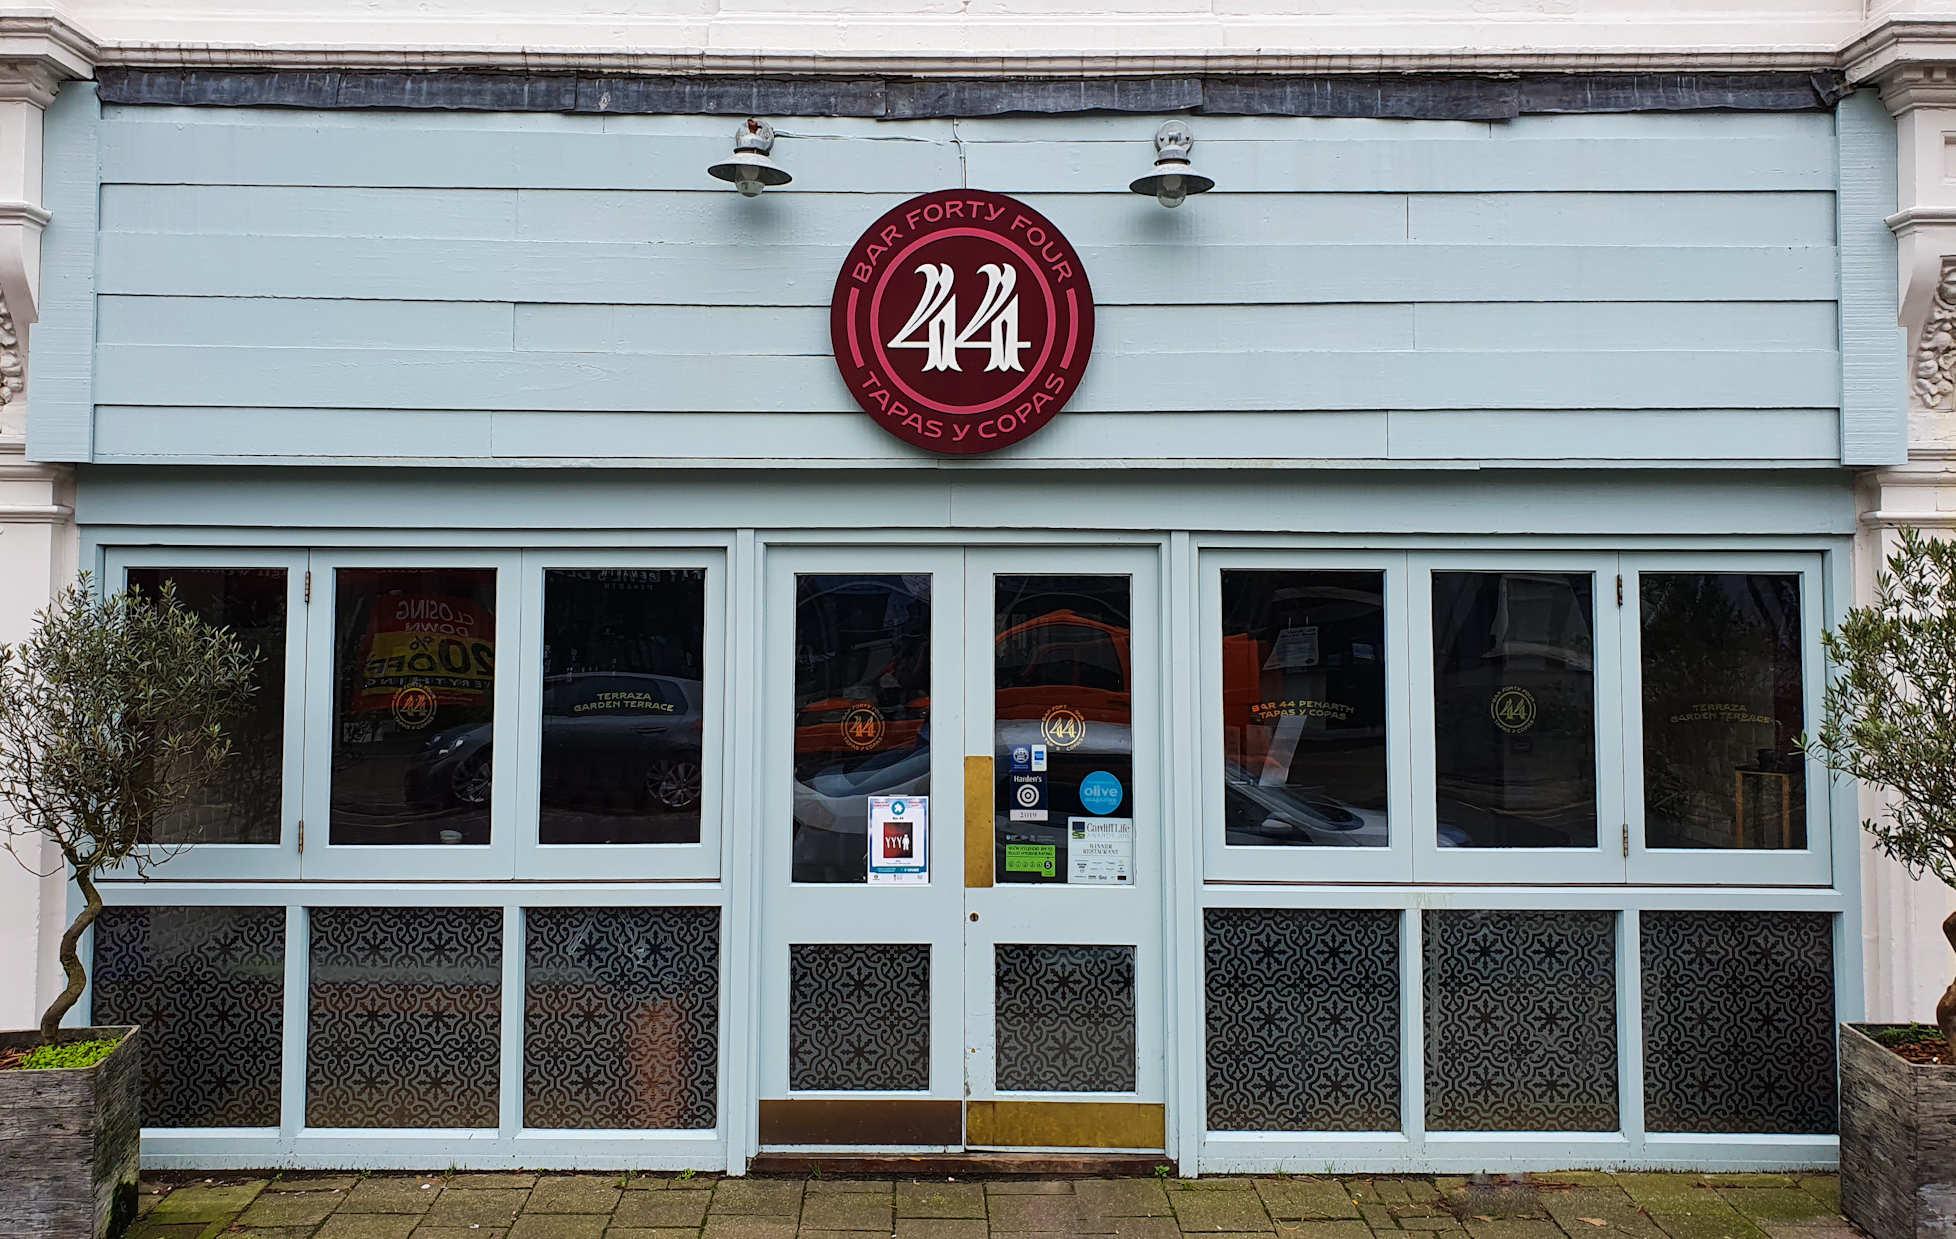 Bar 44 Penarth